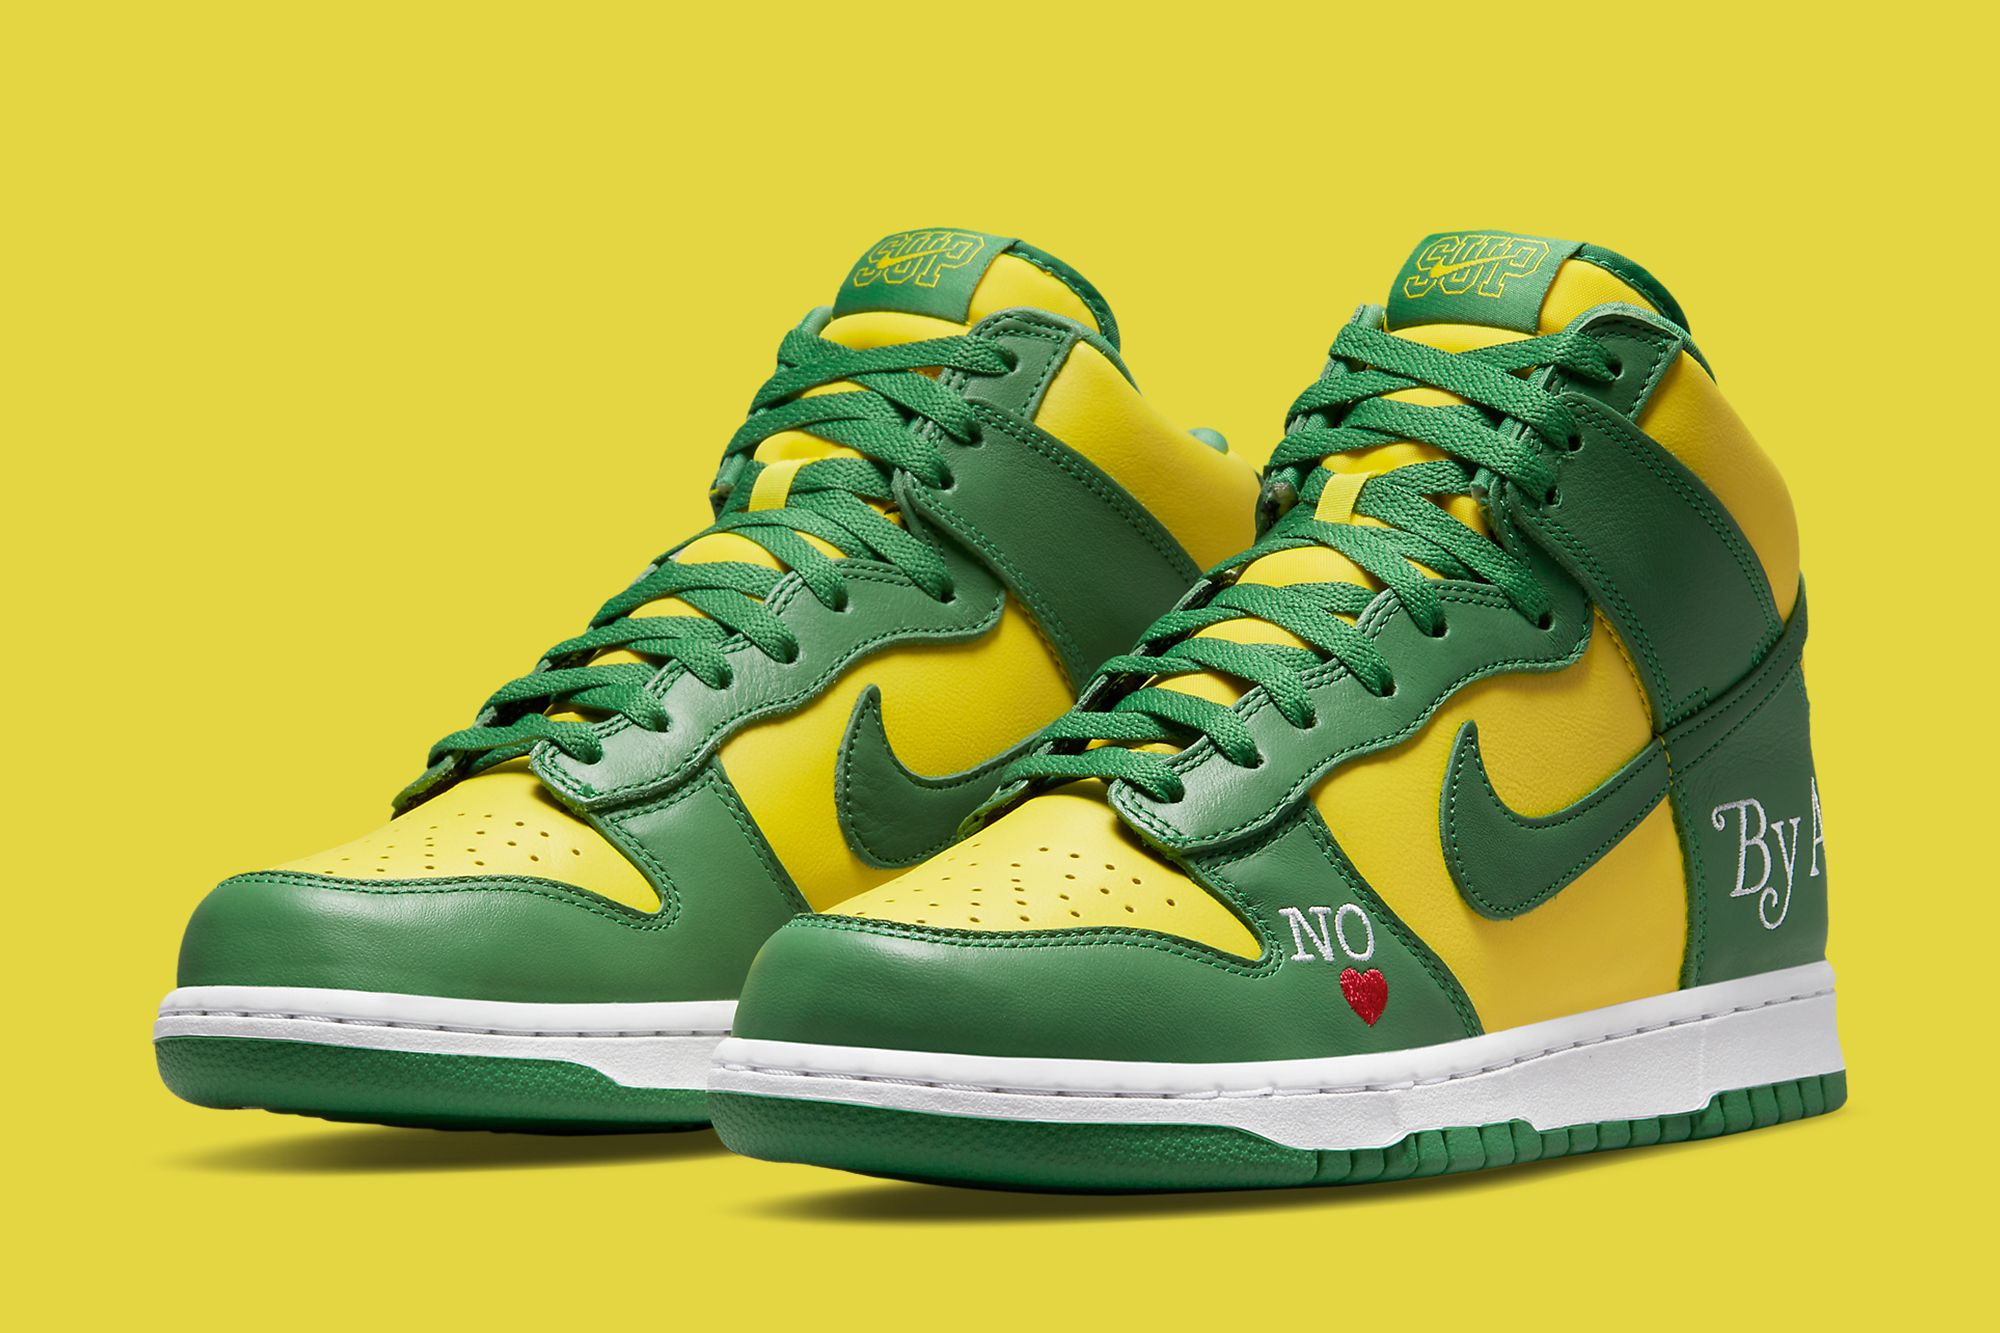 Supreme x Nike SB Dunk High 'Brazil' Official Images